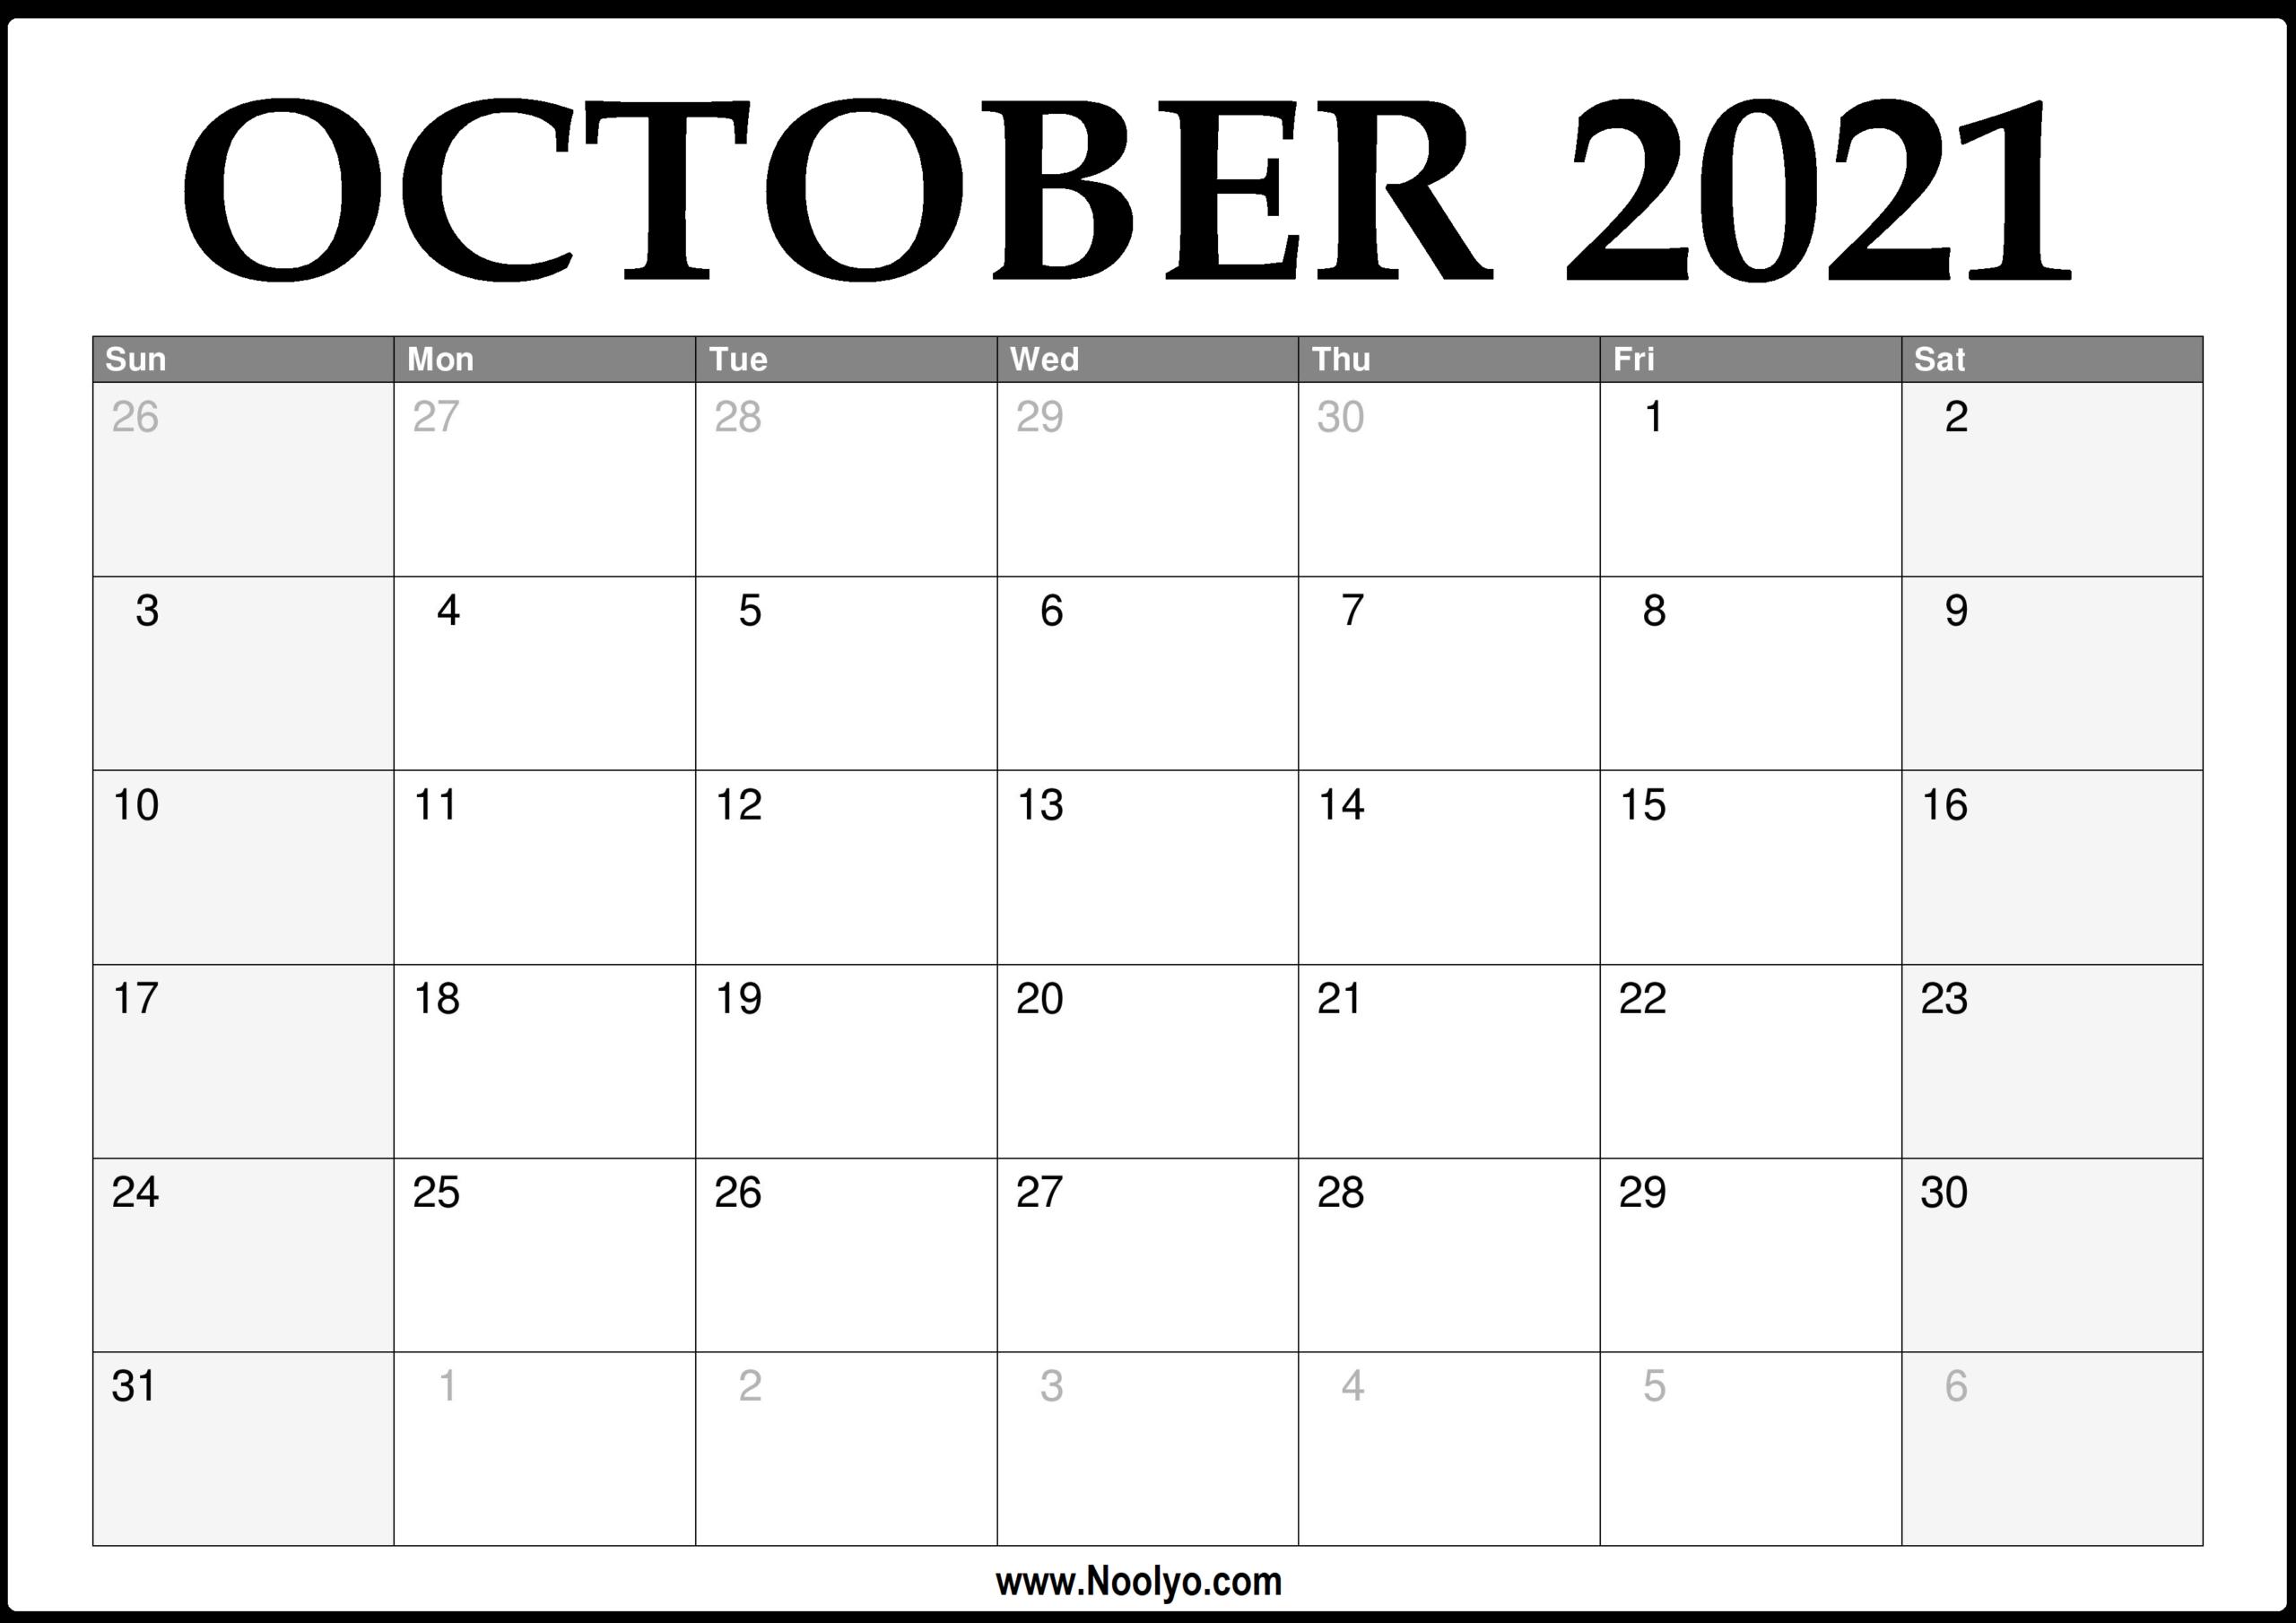 October 2021 Thru December 2021 Calendar   Calendar